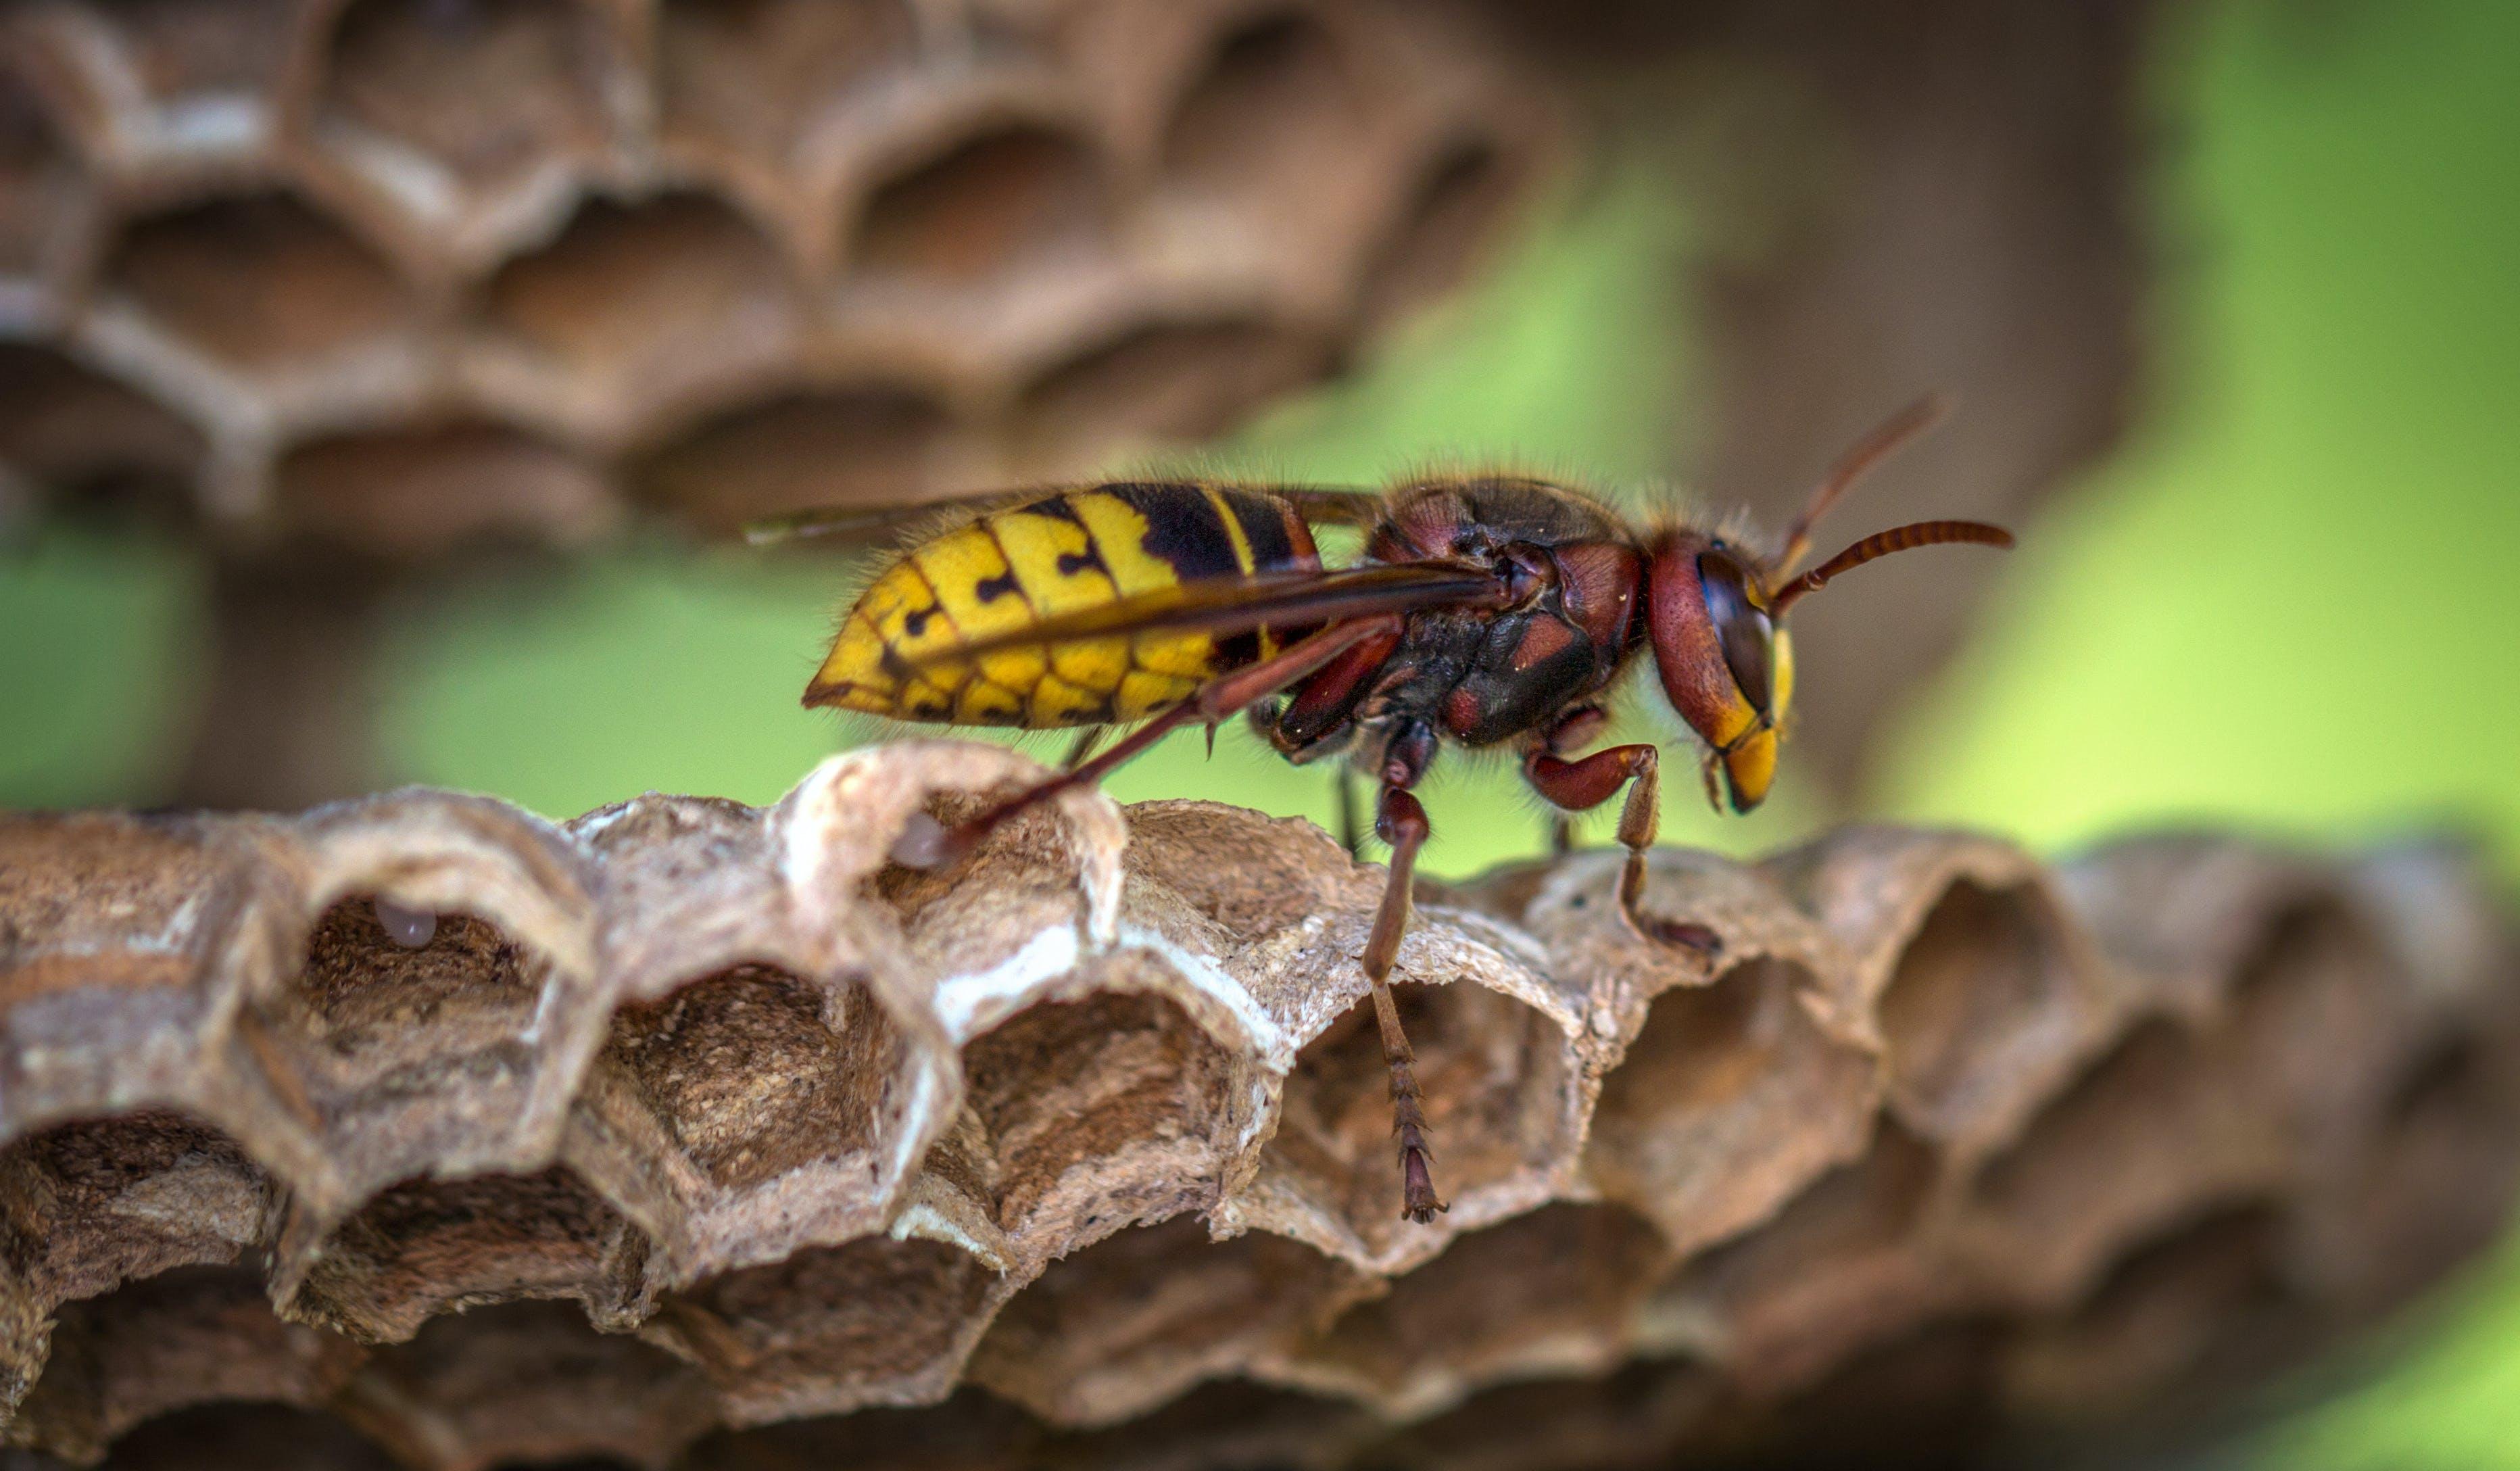 Yellow Jacket Wasp on Hive Closeup Photography